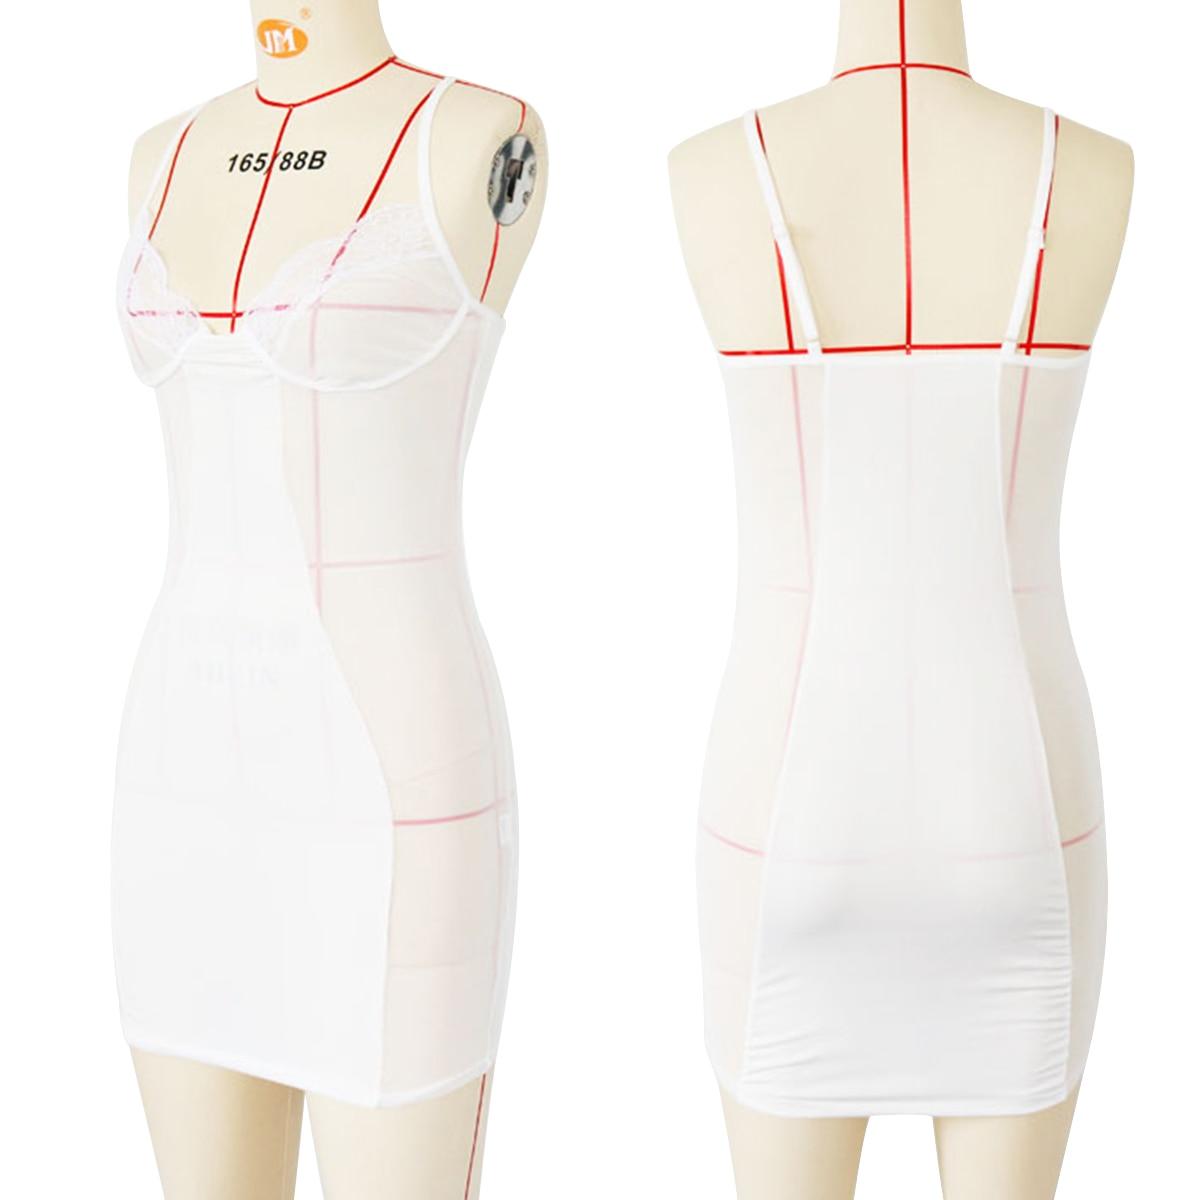 Woman Mesh Dress - Mini, Perspective, Black/White